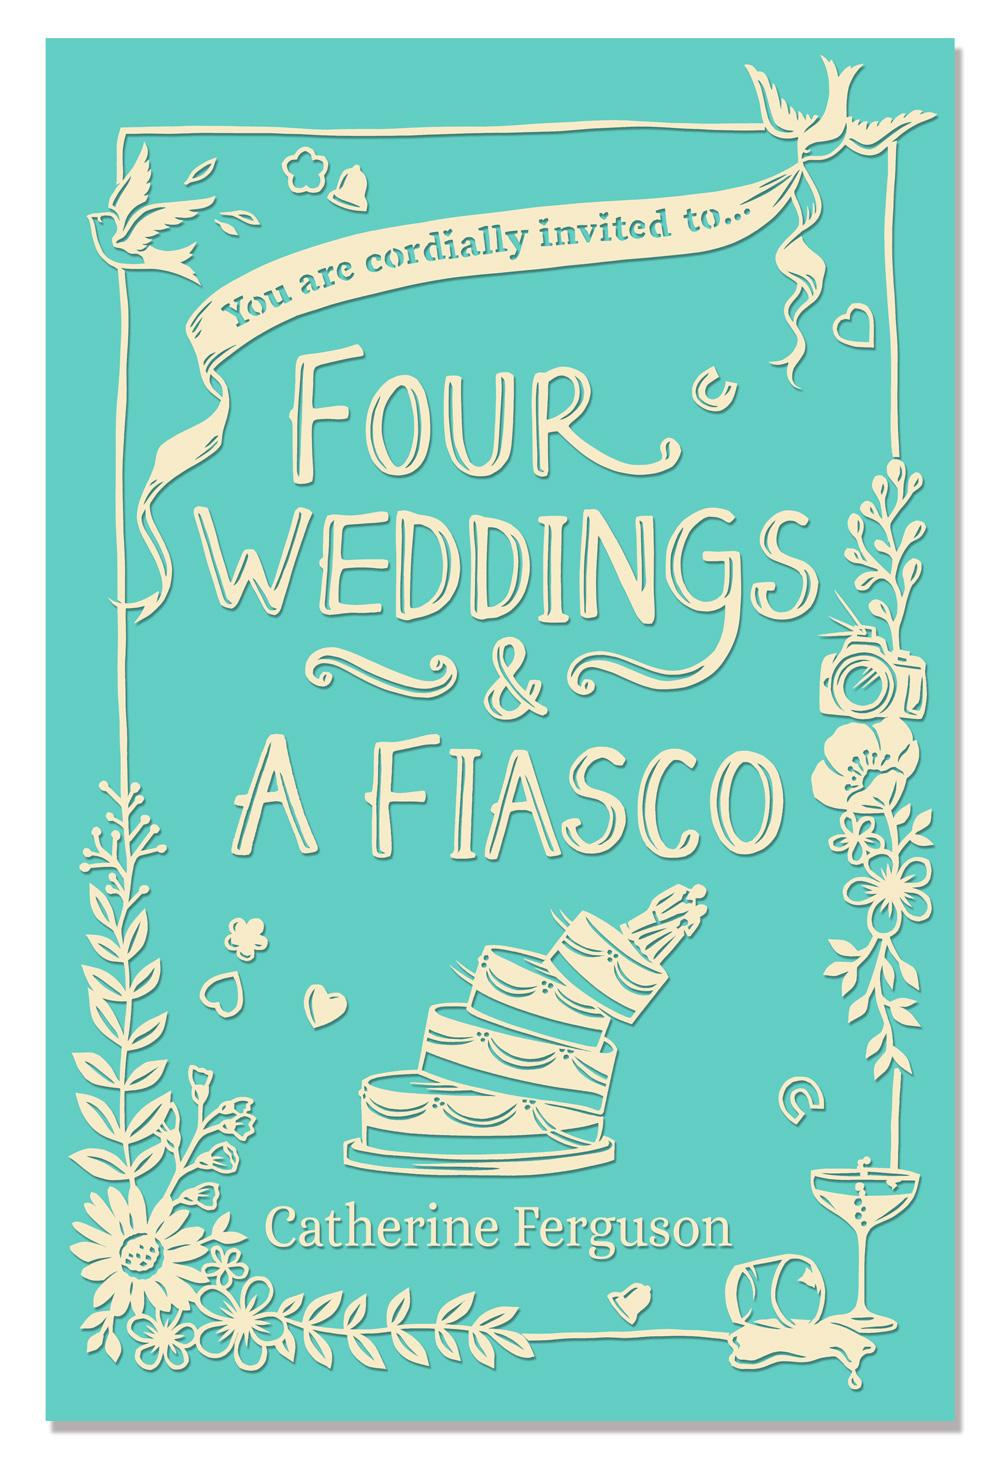 papercutting-four-weddings-and-a-fiasco-julene-harrison